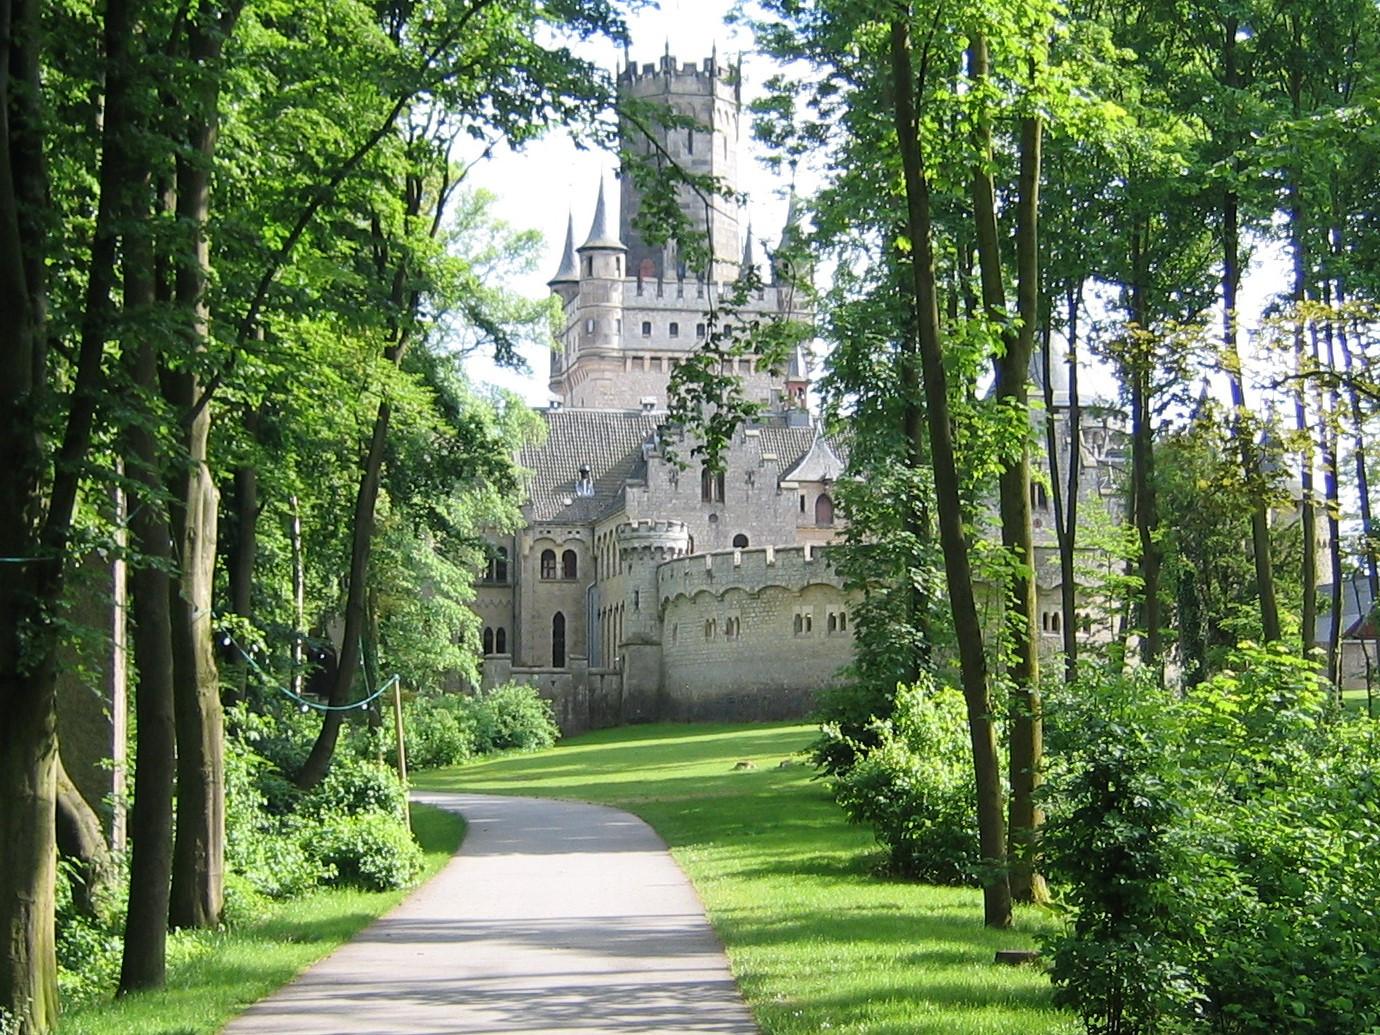 Bilde av Schloss Marienburg